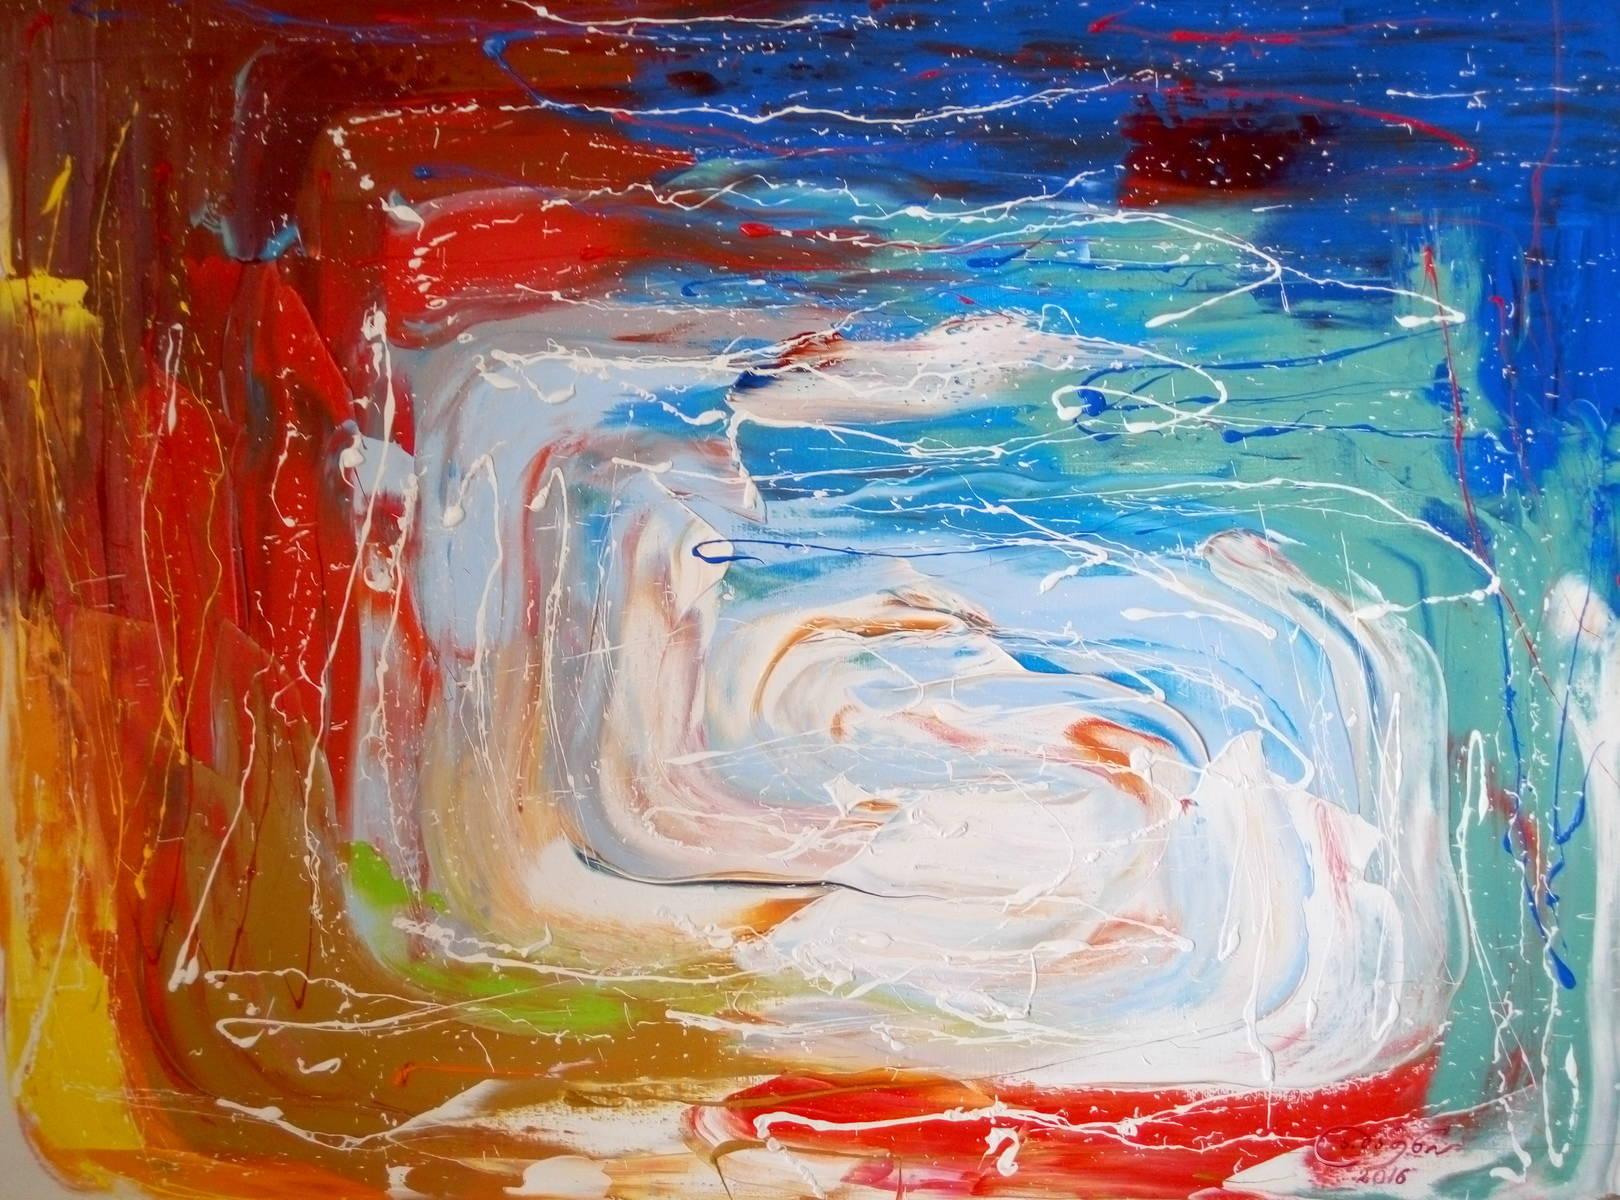 «Вход в лабиринт»                             холст, масло «Entrance to the maze»                       oil on canvas                                                50x60,  2016